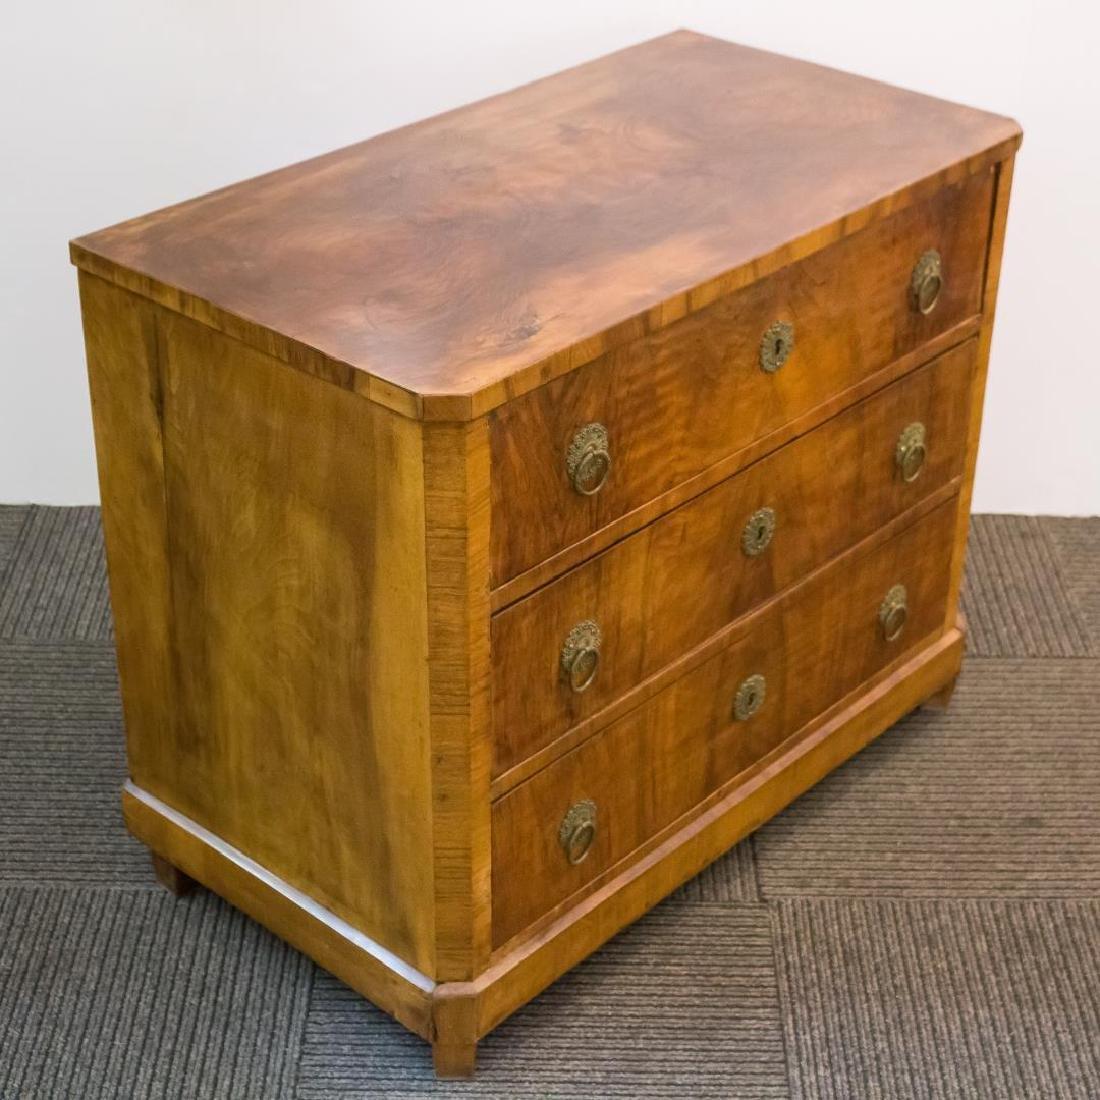 Biedermeier Burlwood Chest of Drawers, Period - 3